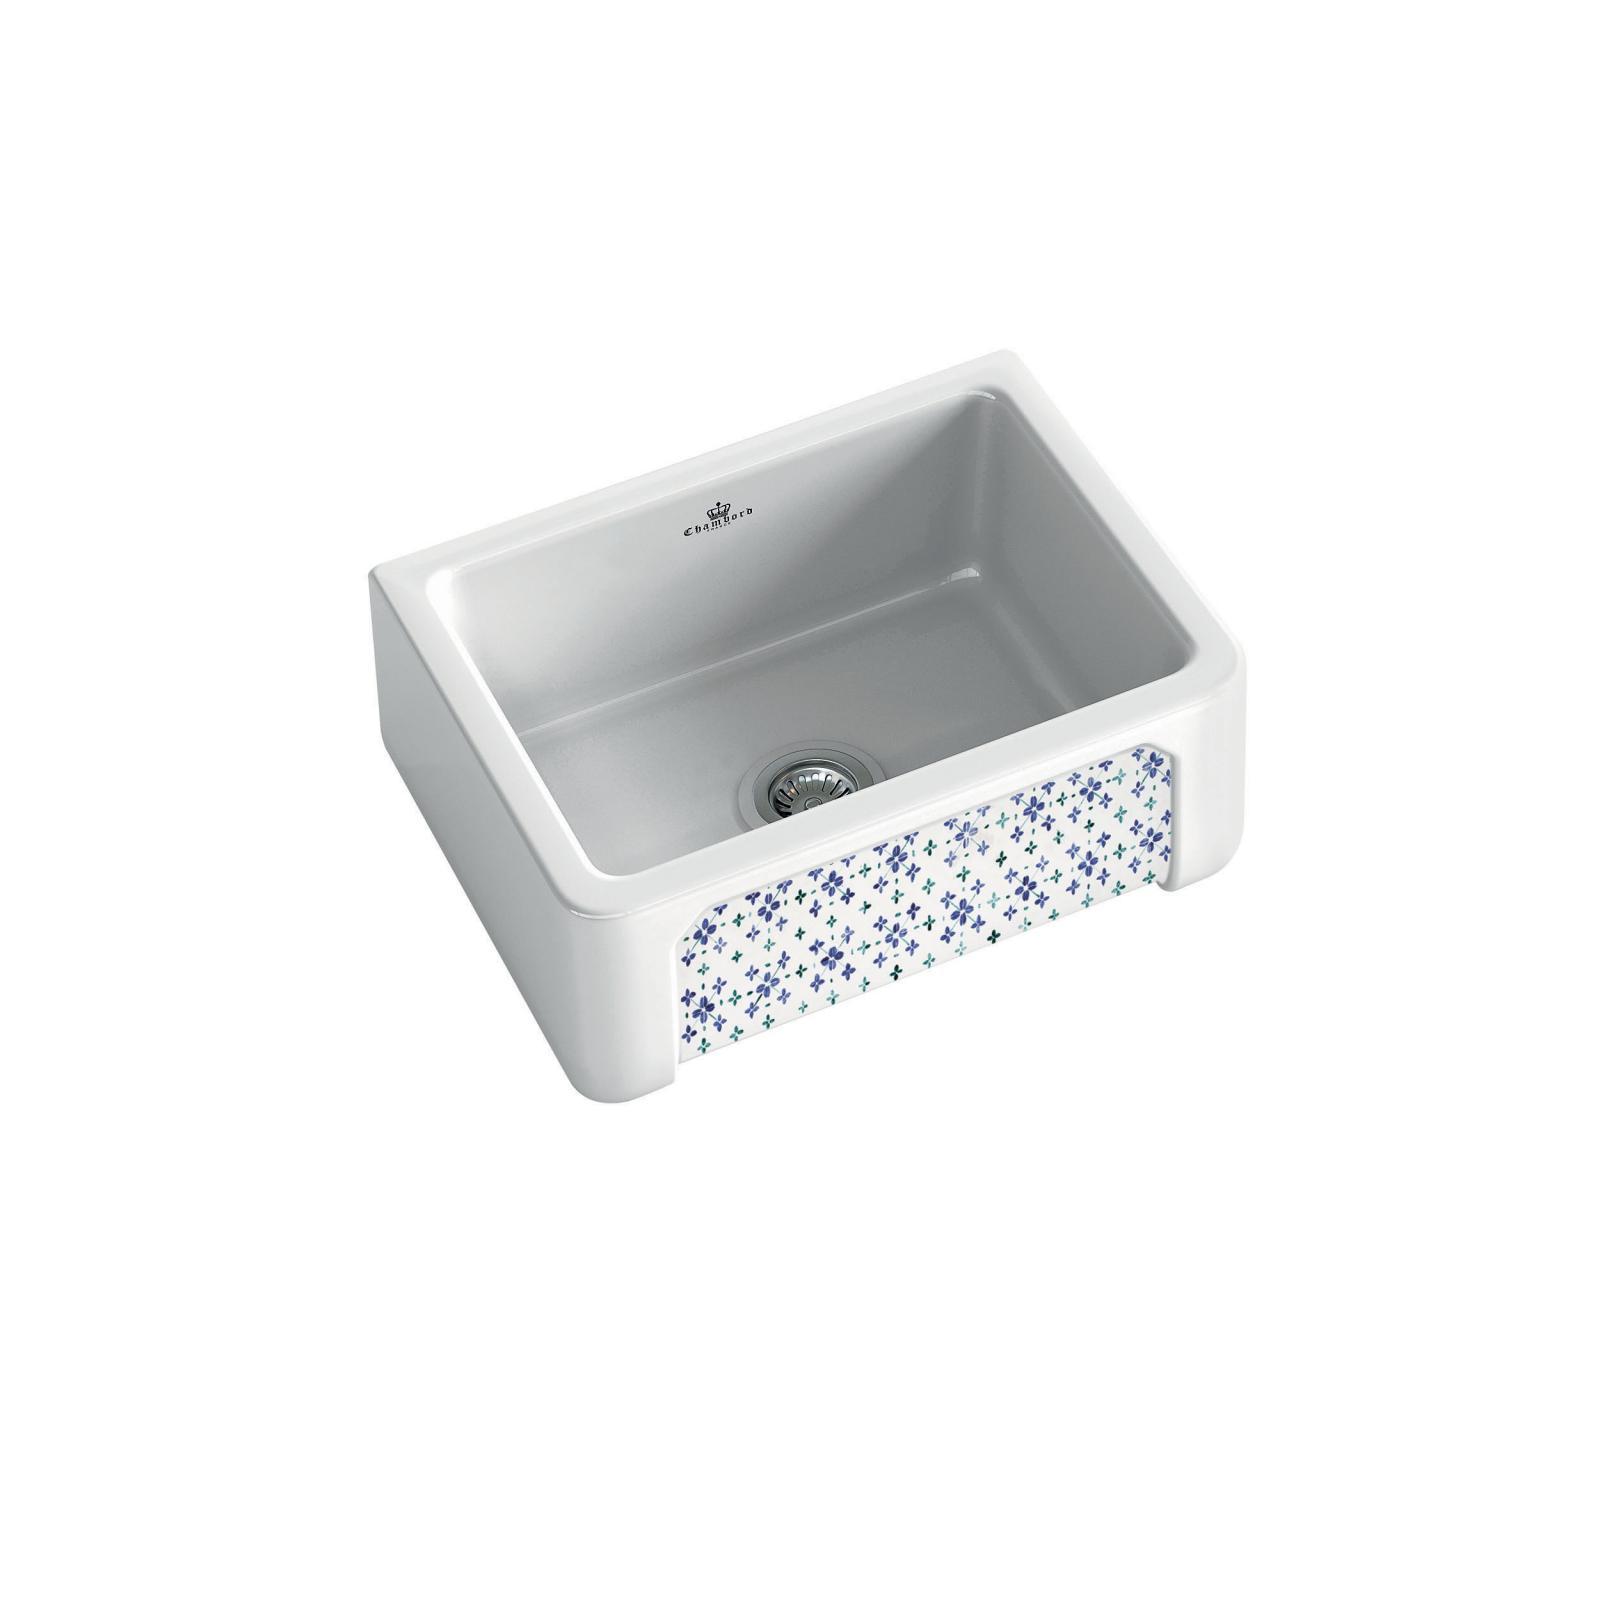 High-quality sink Henri I Bretagne - single bowl, decorated ceramic - ambience 1